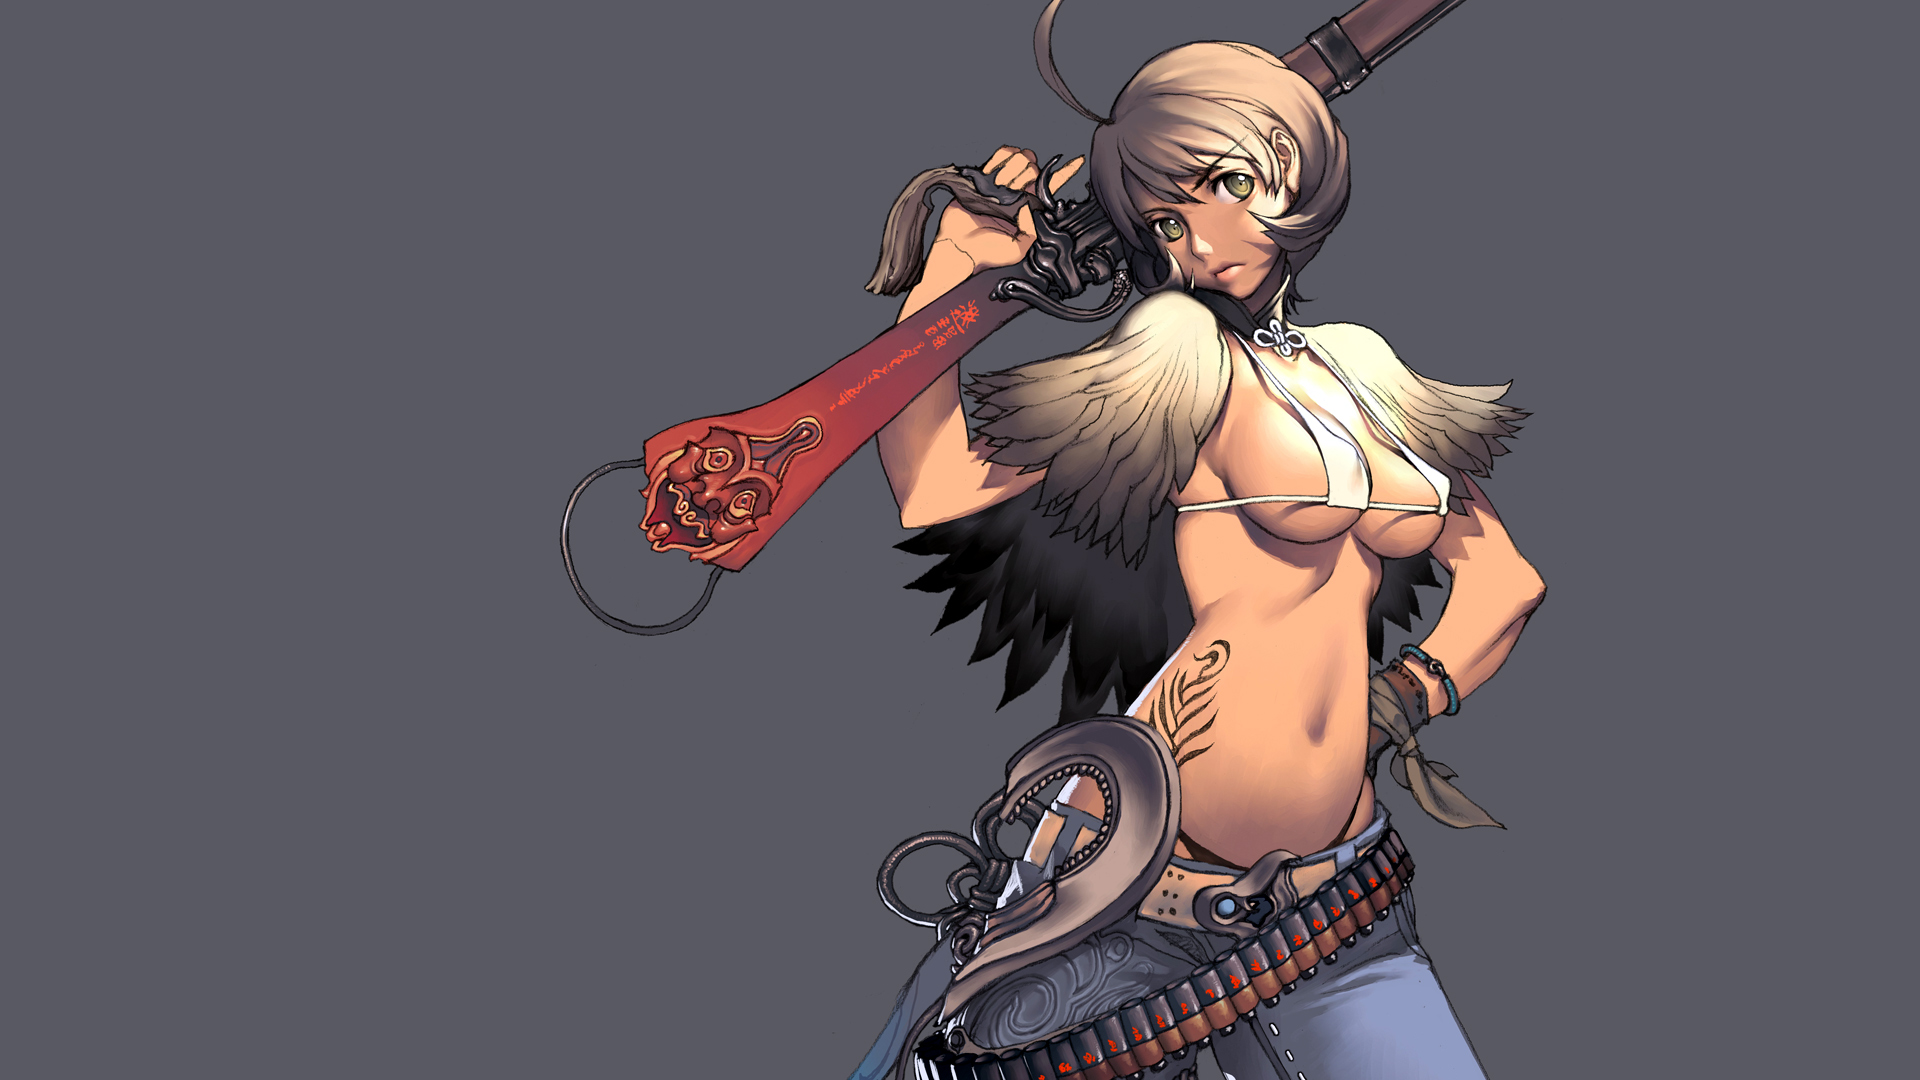 Blade and soul fuck 3gp naked comic